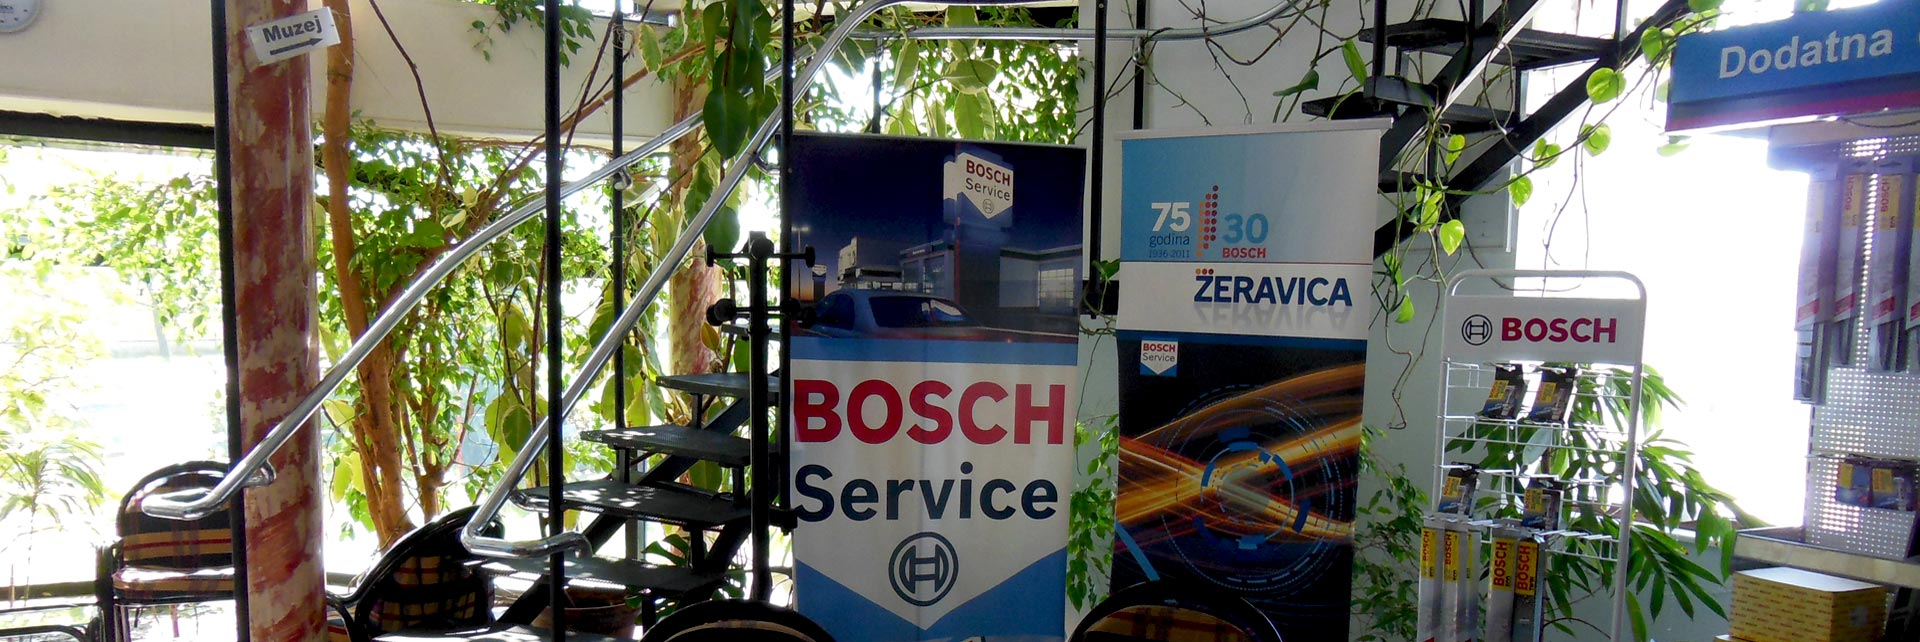 Žeravica  servis Bosch kvaliteta